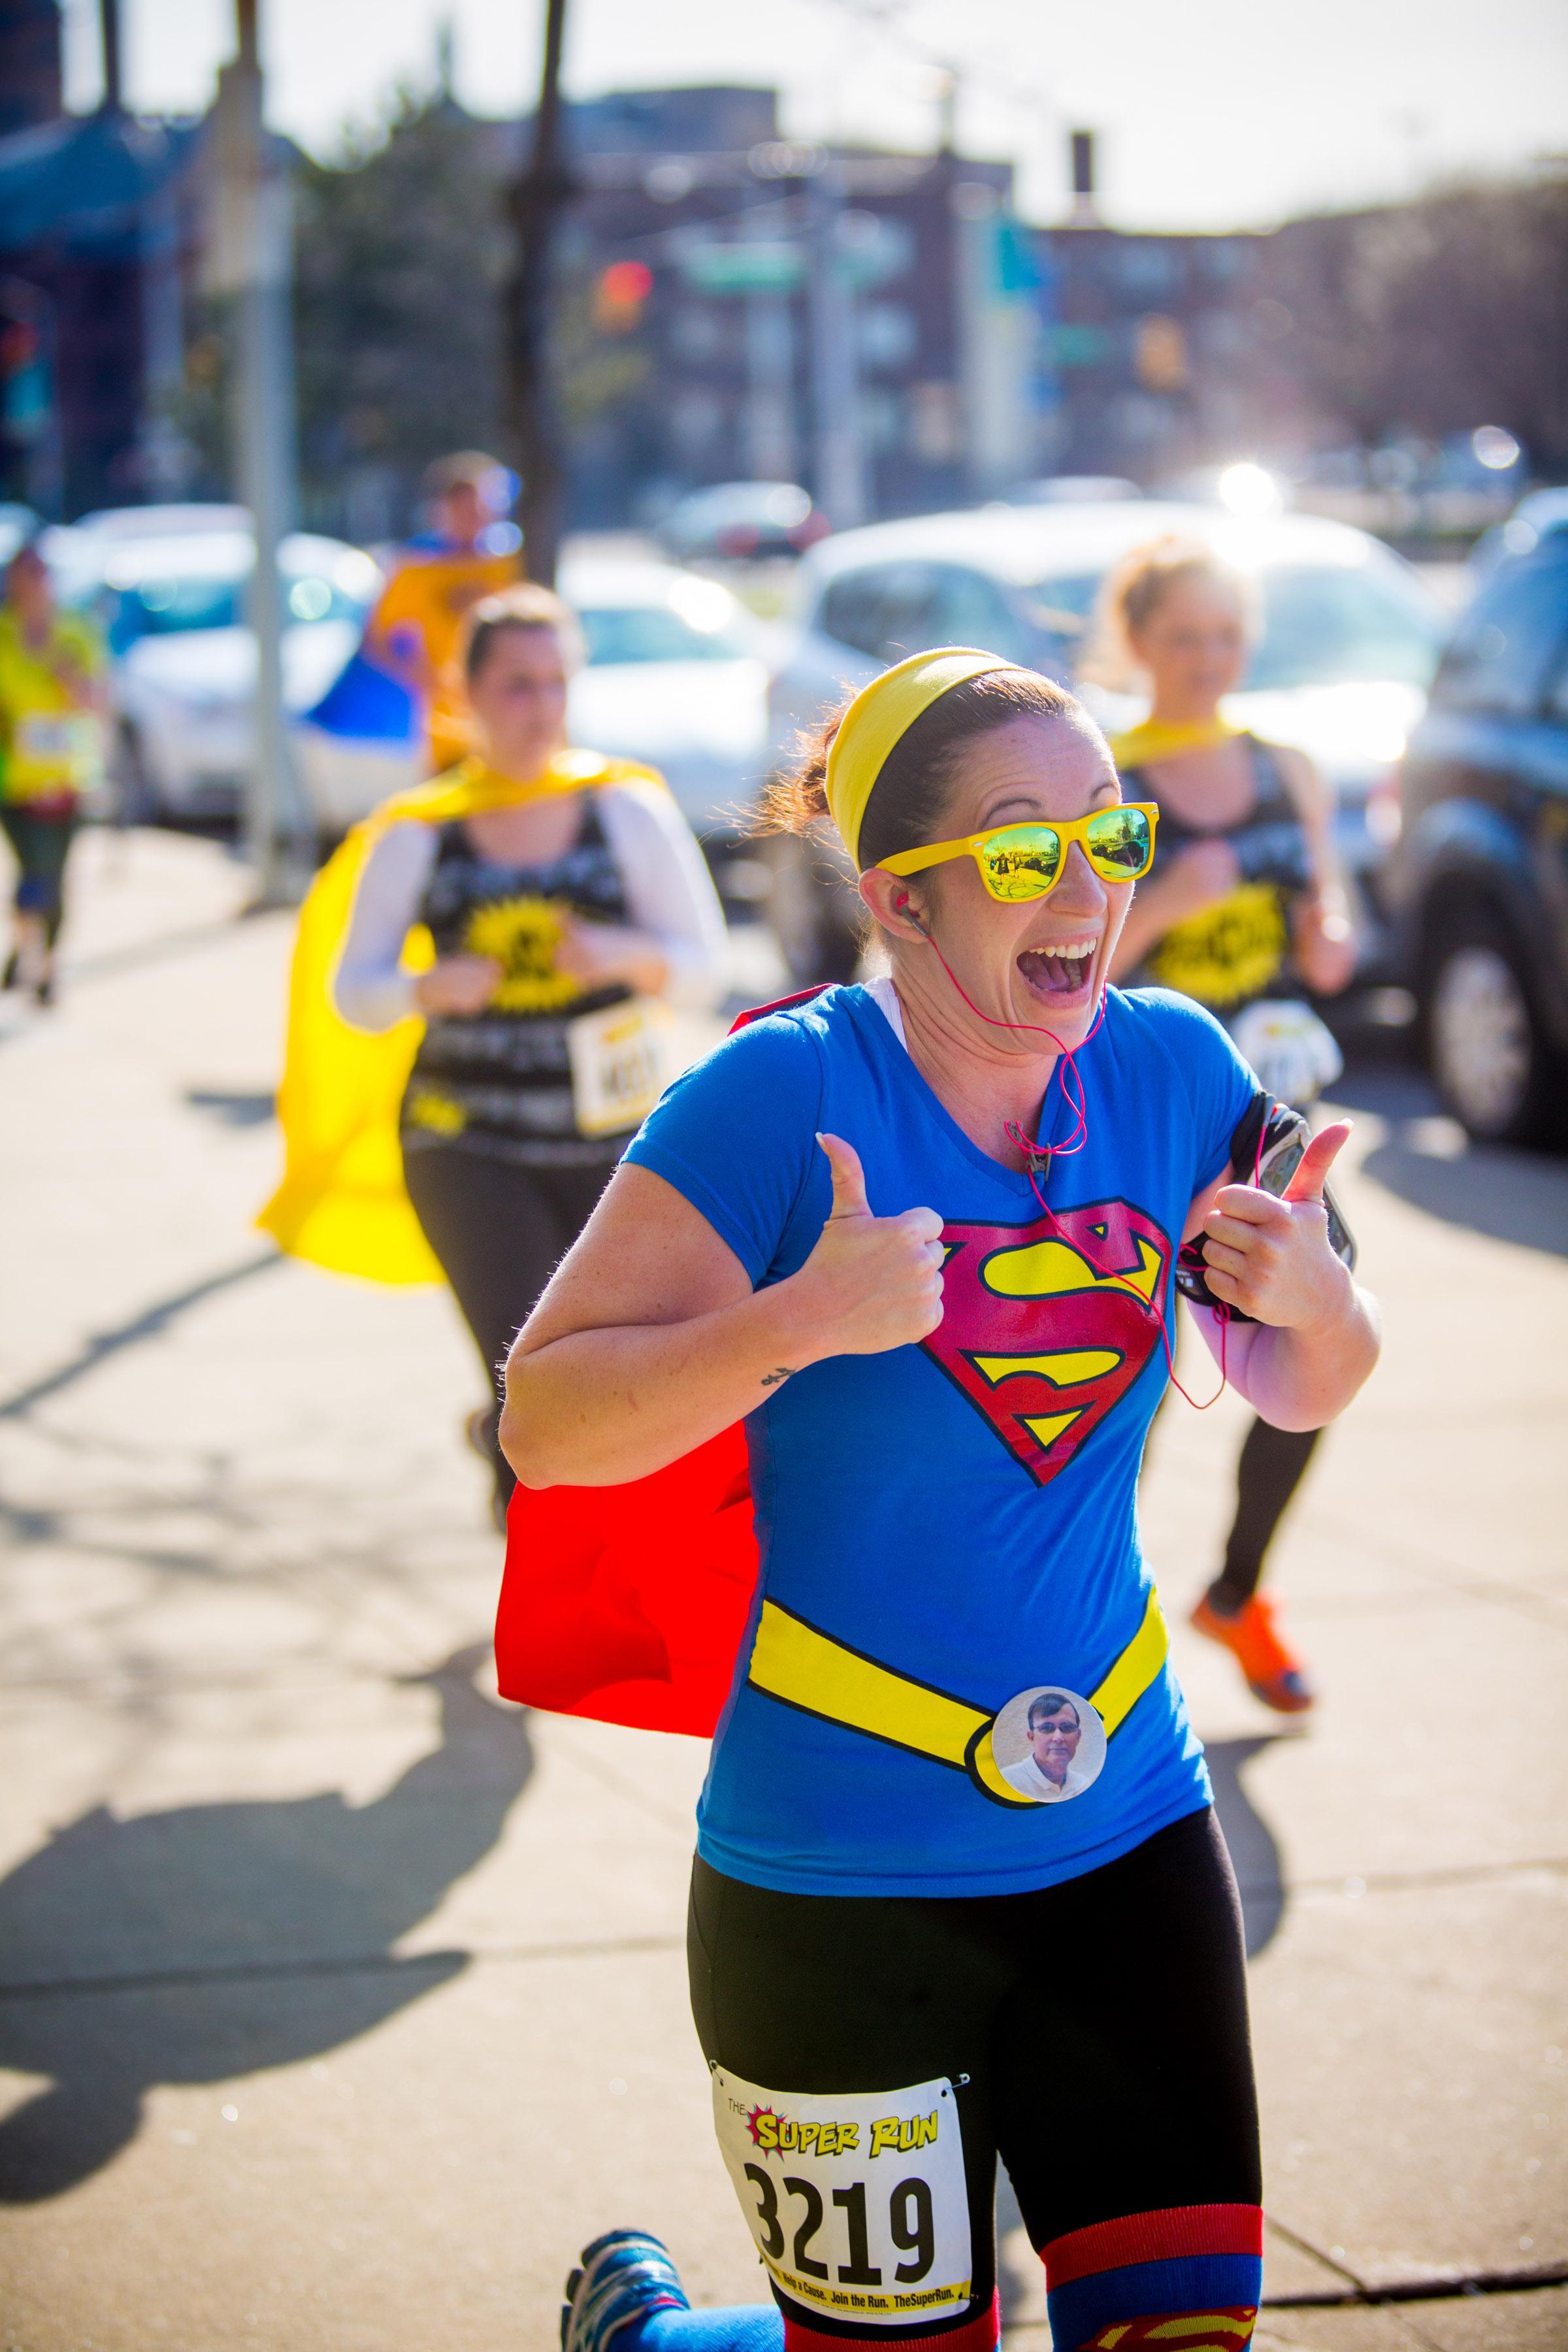 The Super Run 5k - Heroes vs. Villains - Roch